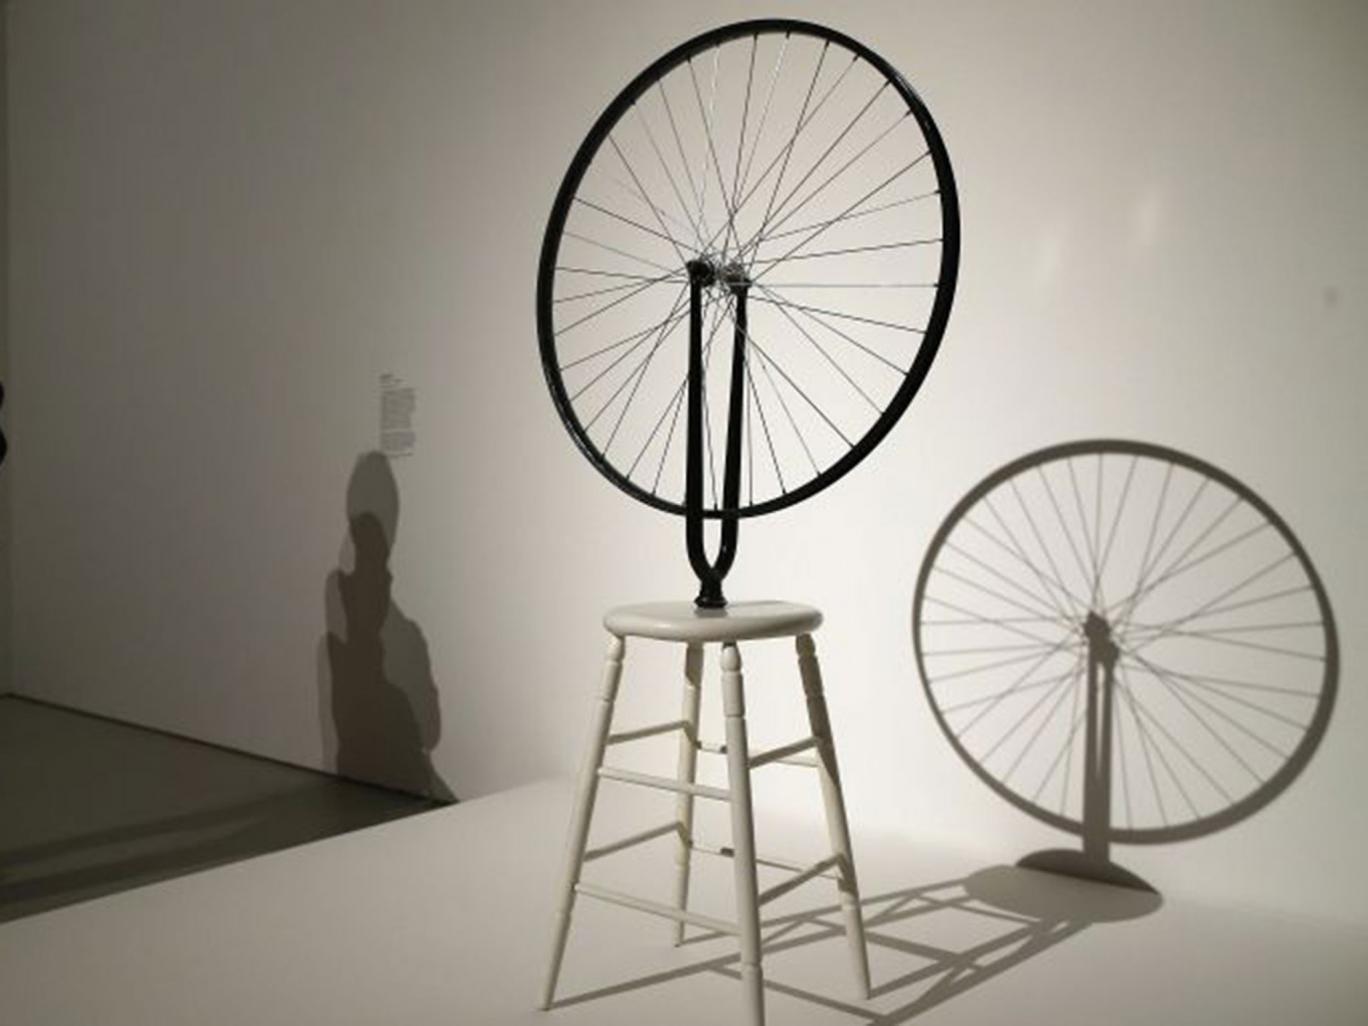 dating evidence duchamp bicycle wheel Glassala tuffm i zimbra gadji beri bimba glandridi lauli lonni the art now look at this marcel duchamp, the bicycle wheel glassala tuffm i zimbra gadji beri.